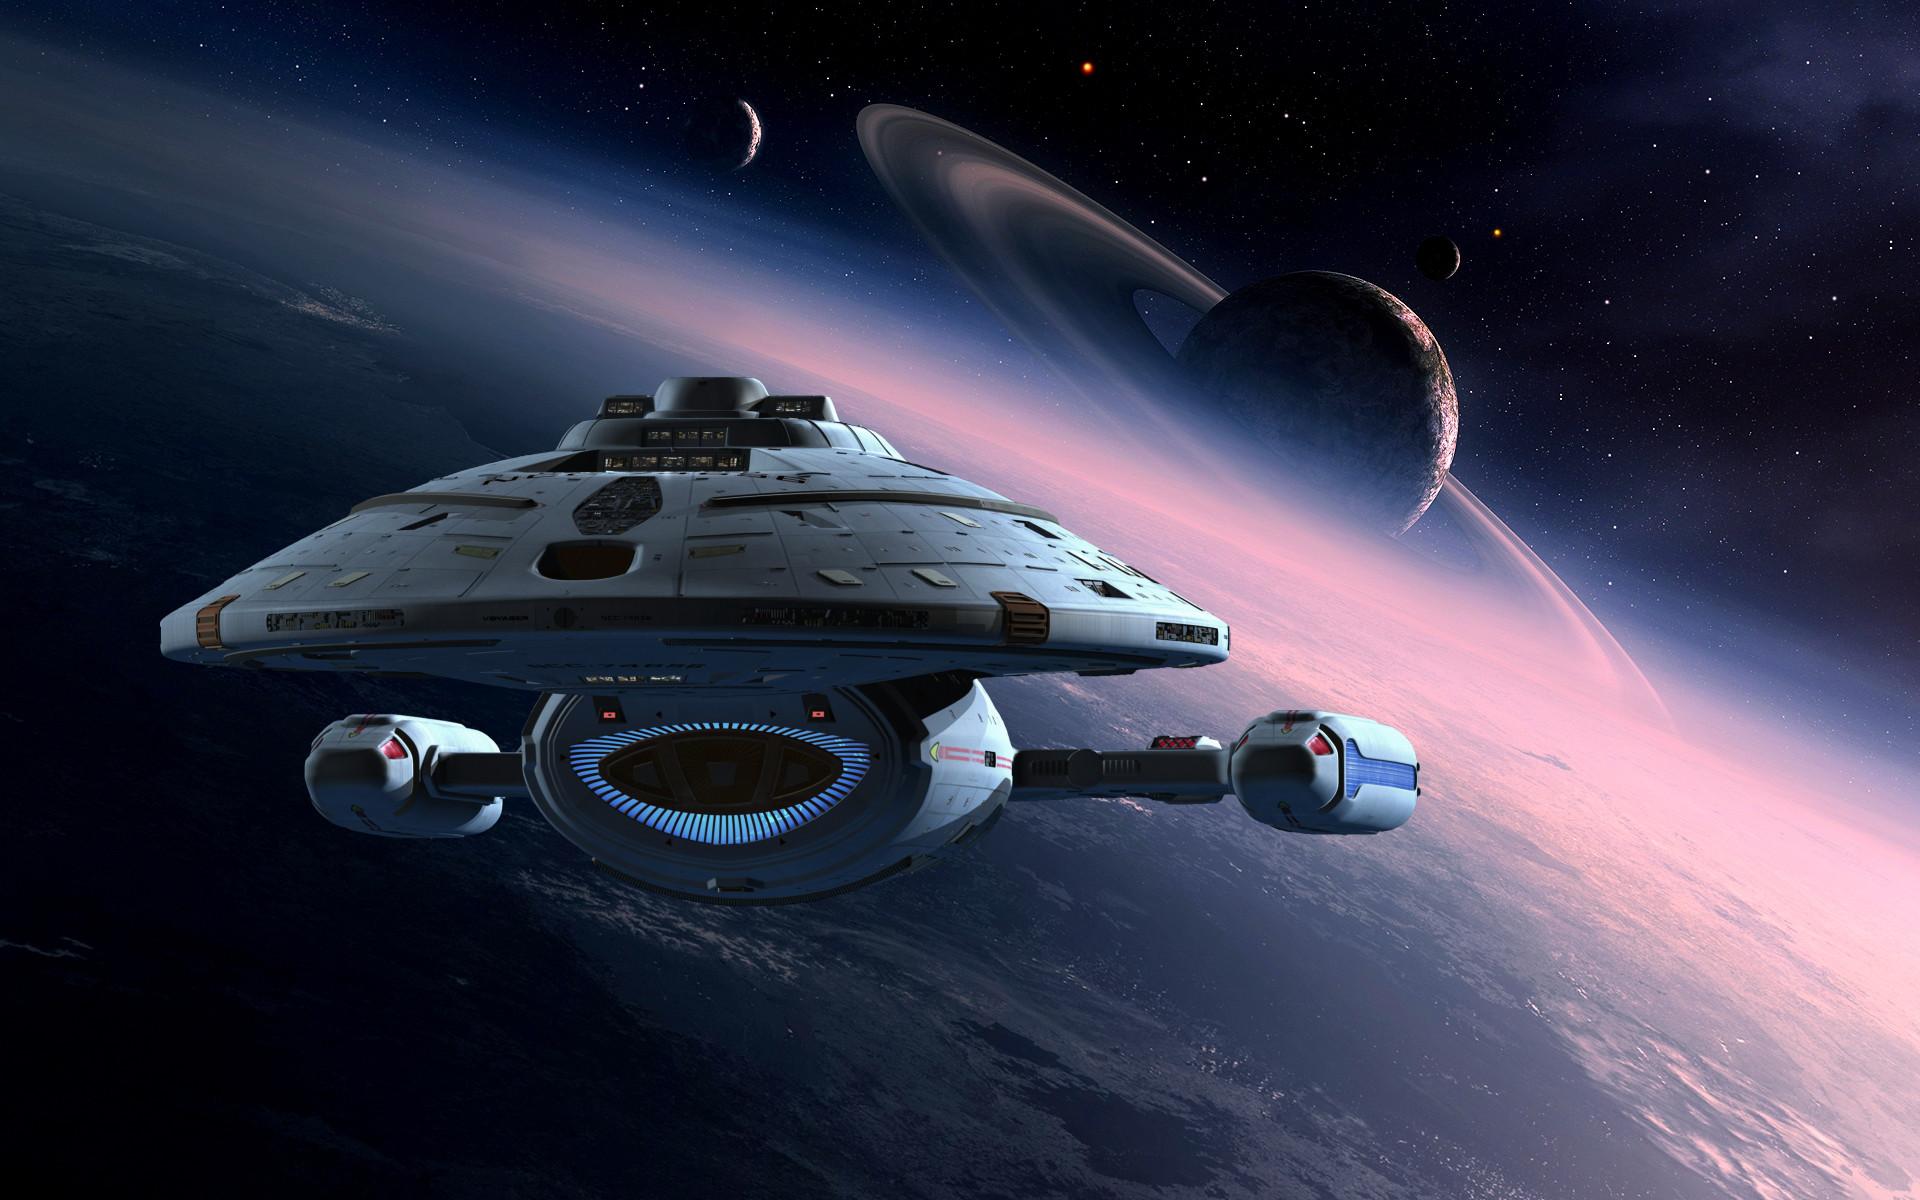 Related Desktop Backgrounds. Star Trek Voyager